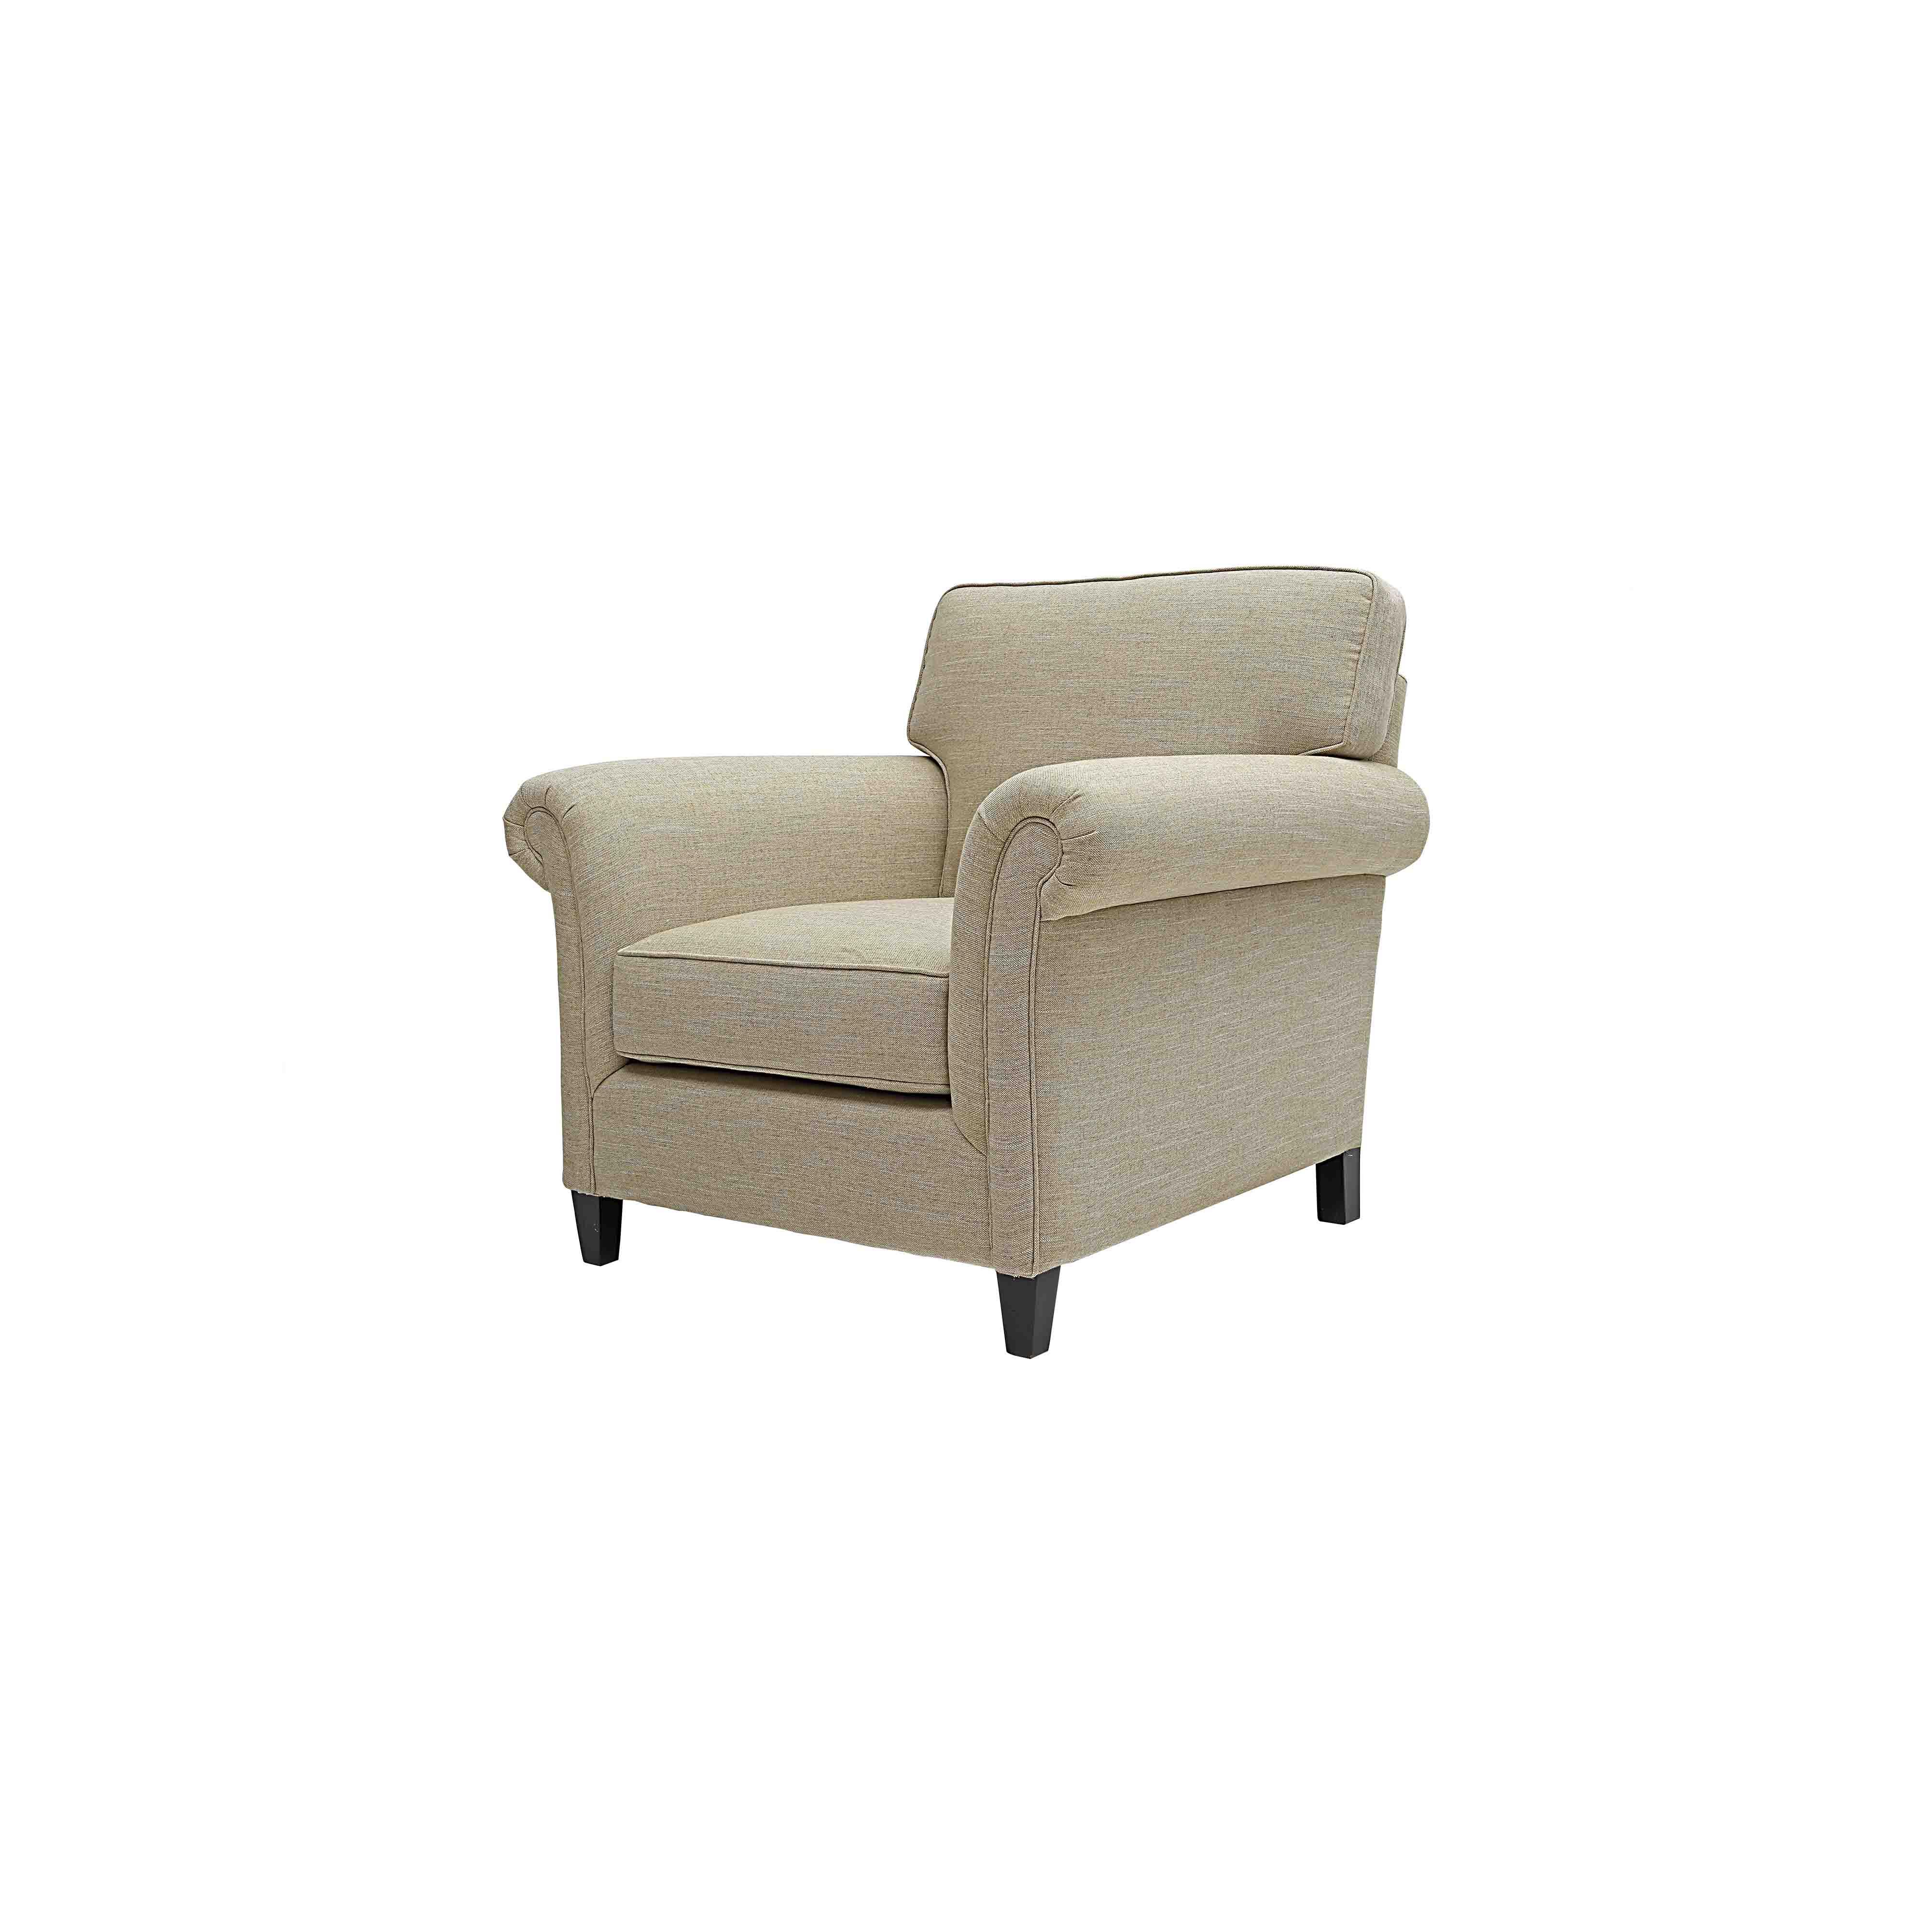 Seraphina armchair